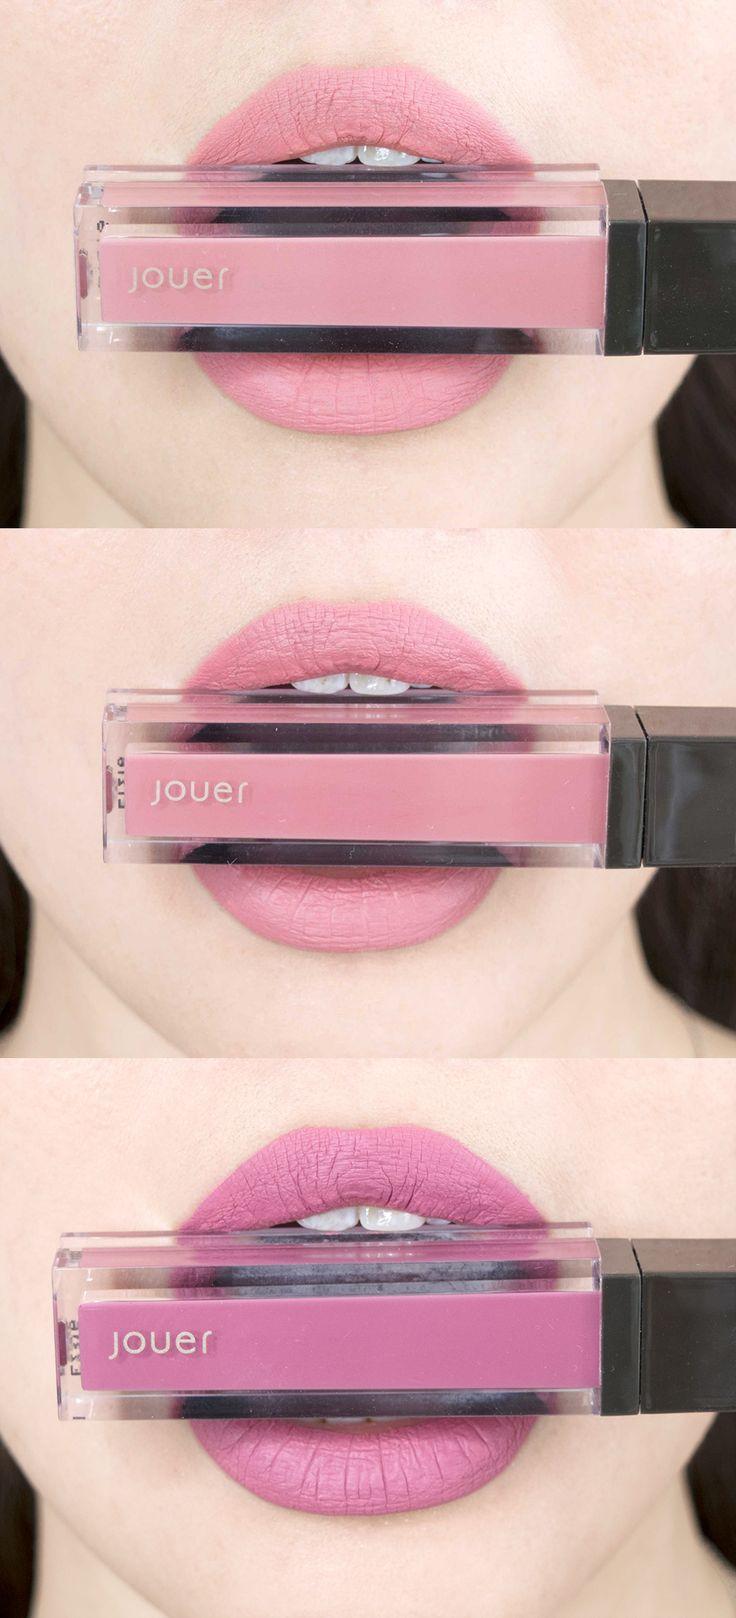 Jouer Cosmetics Long Wear Lip Creme Liquid Lipstick Swatches Combined